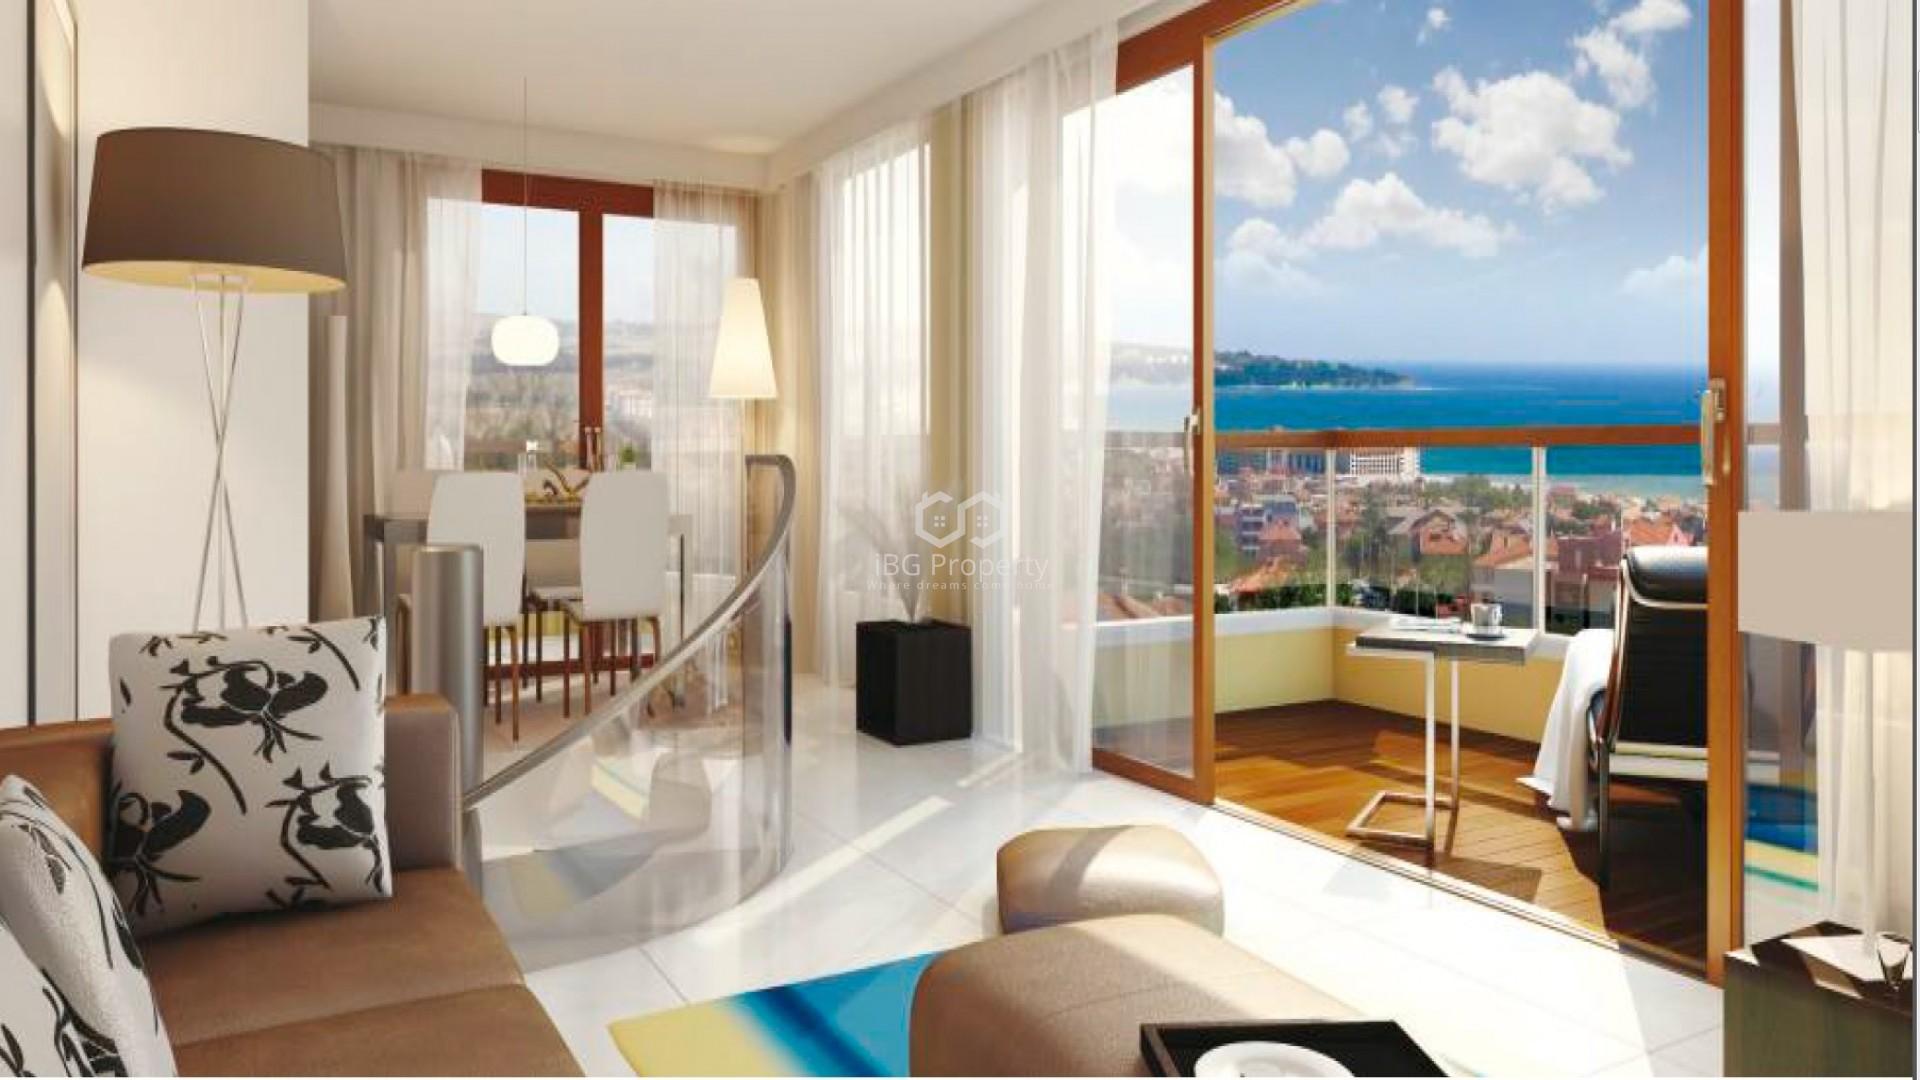 Двухкомнатная квартира Обзор 103 m2